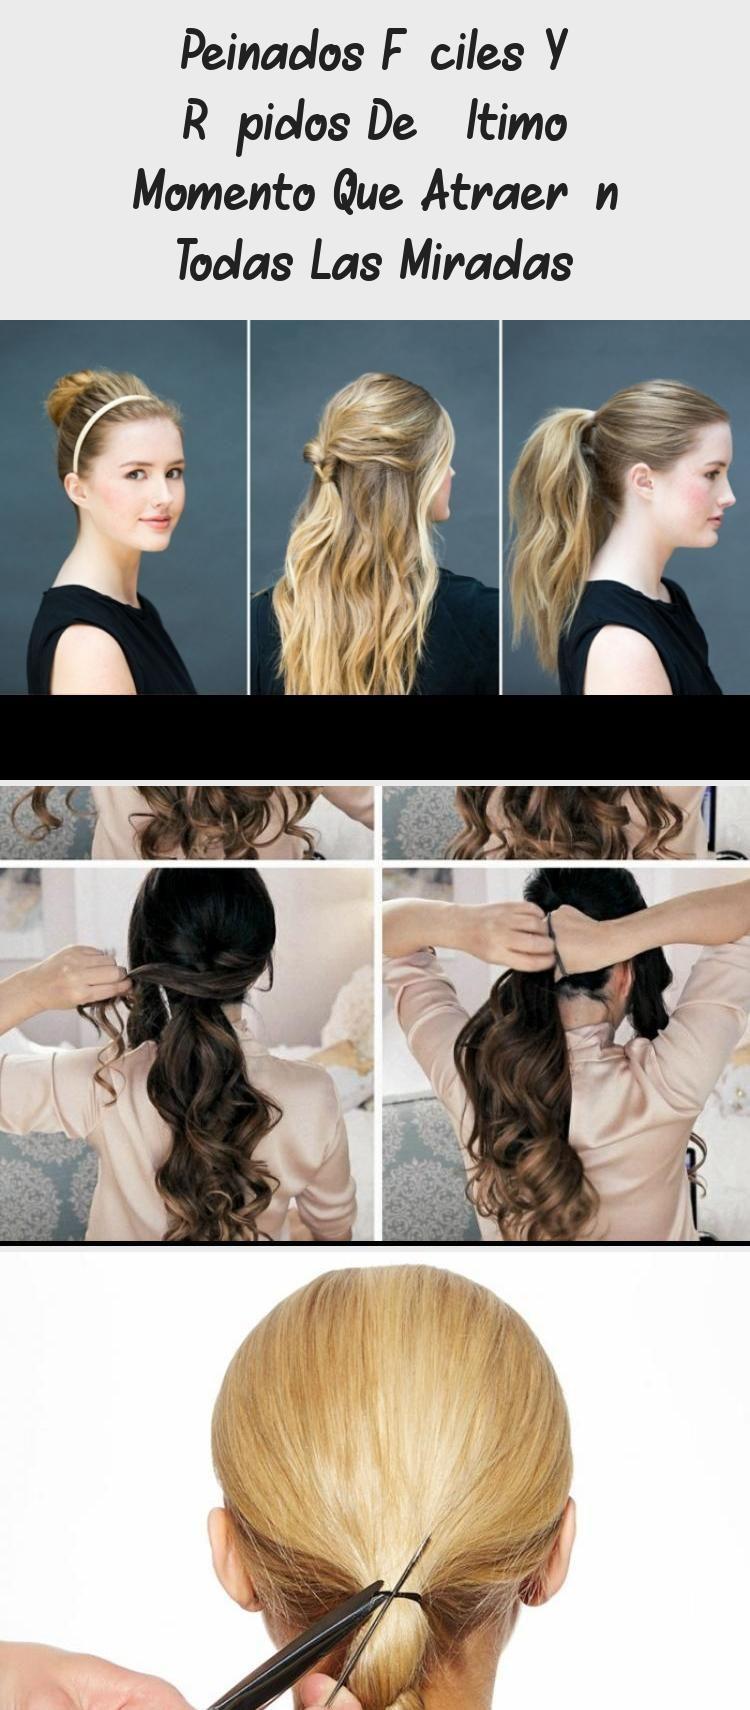 Peinados Faciles Y Rapidos De Ultimo Momento Que Atraeran Todas Las Miradas Fast Hairstyles Hair Styles Low Bun